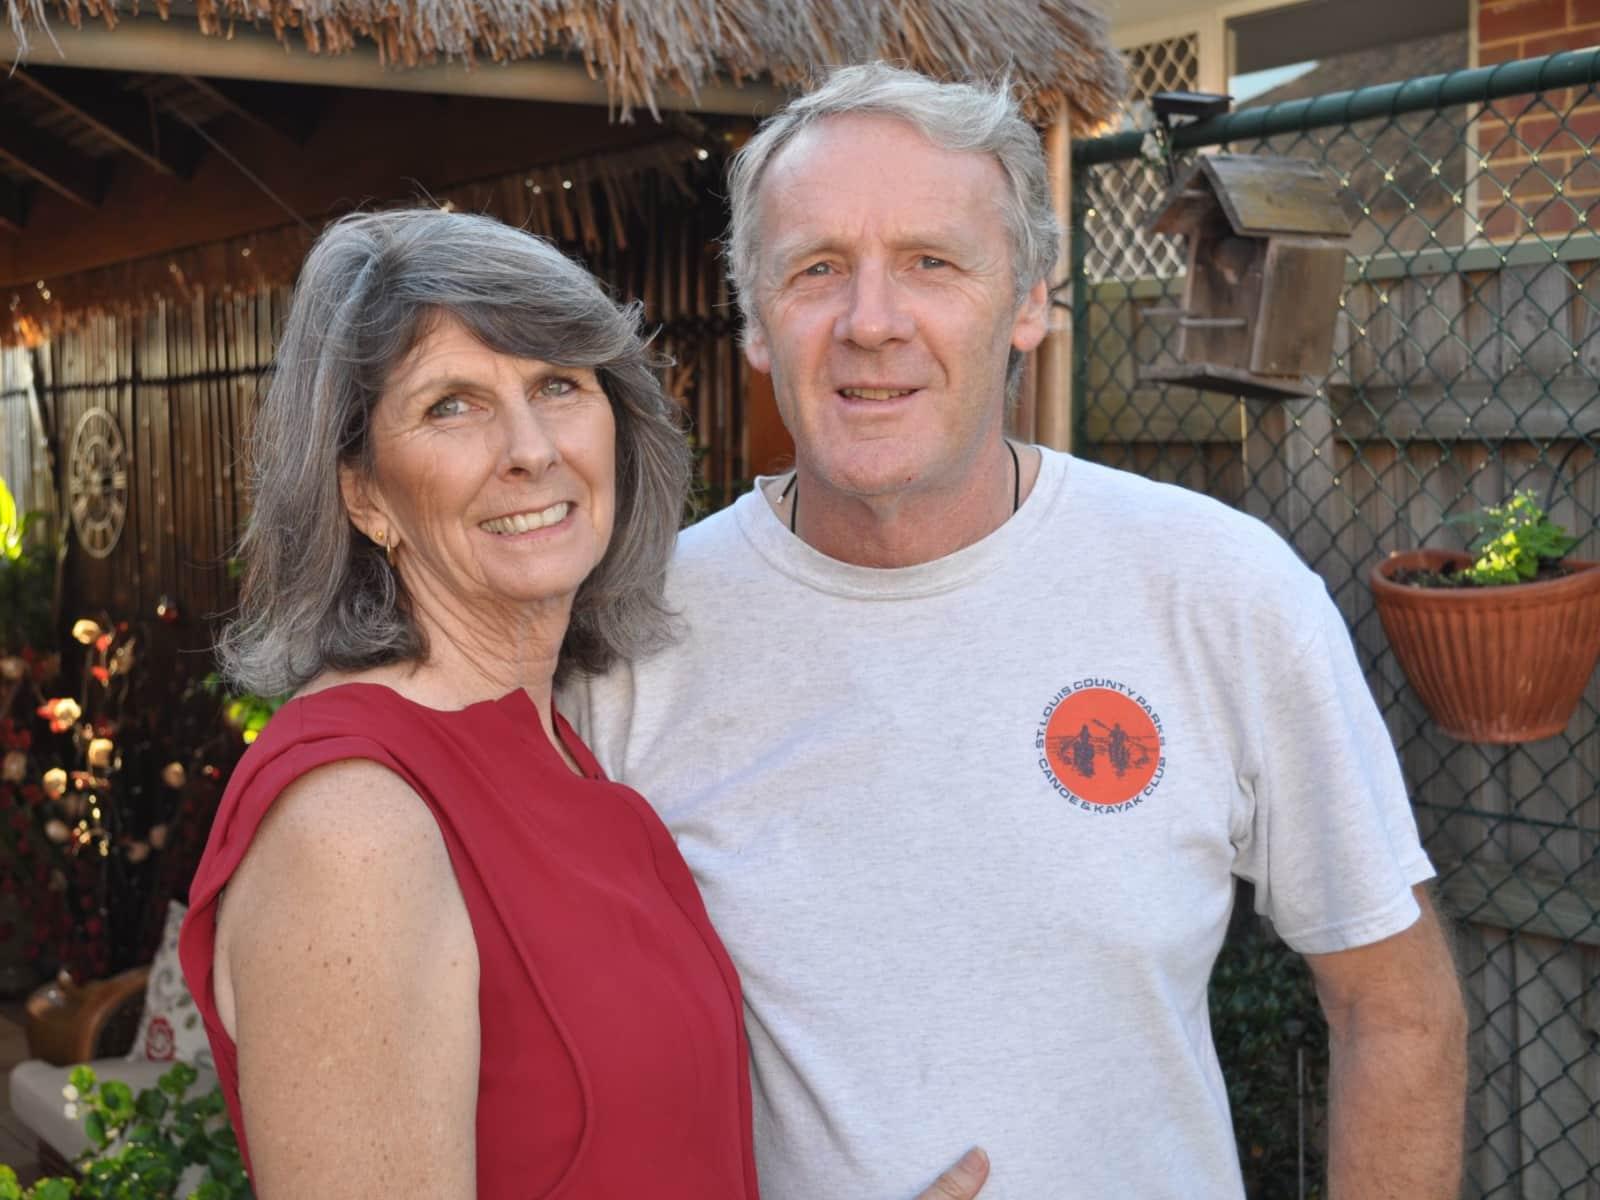 Robert & Barbara from Perth, Western Australia, Australia